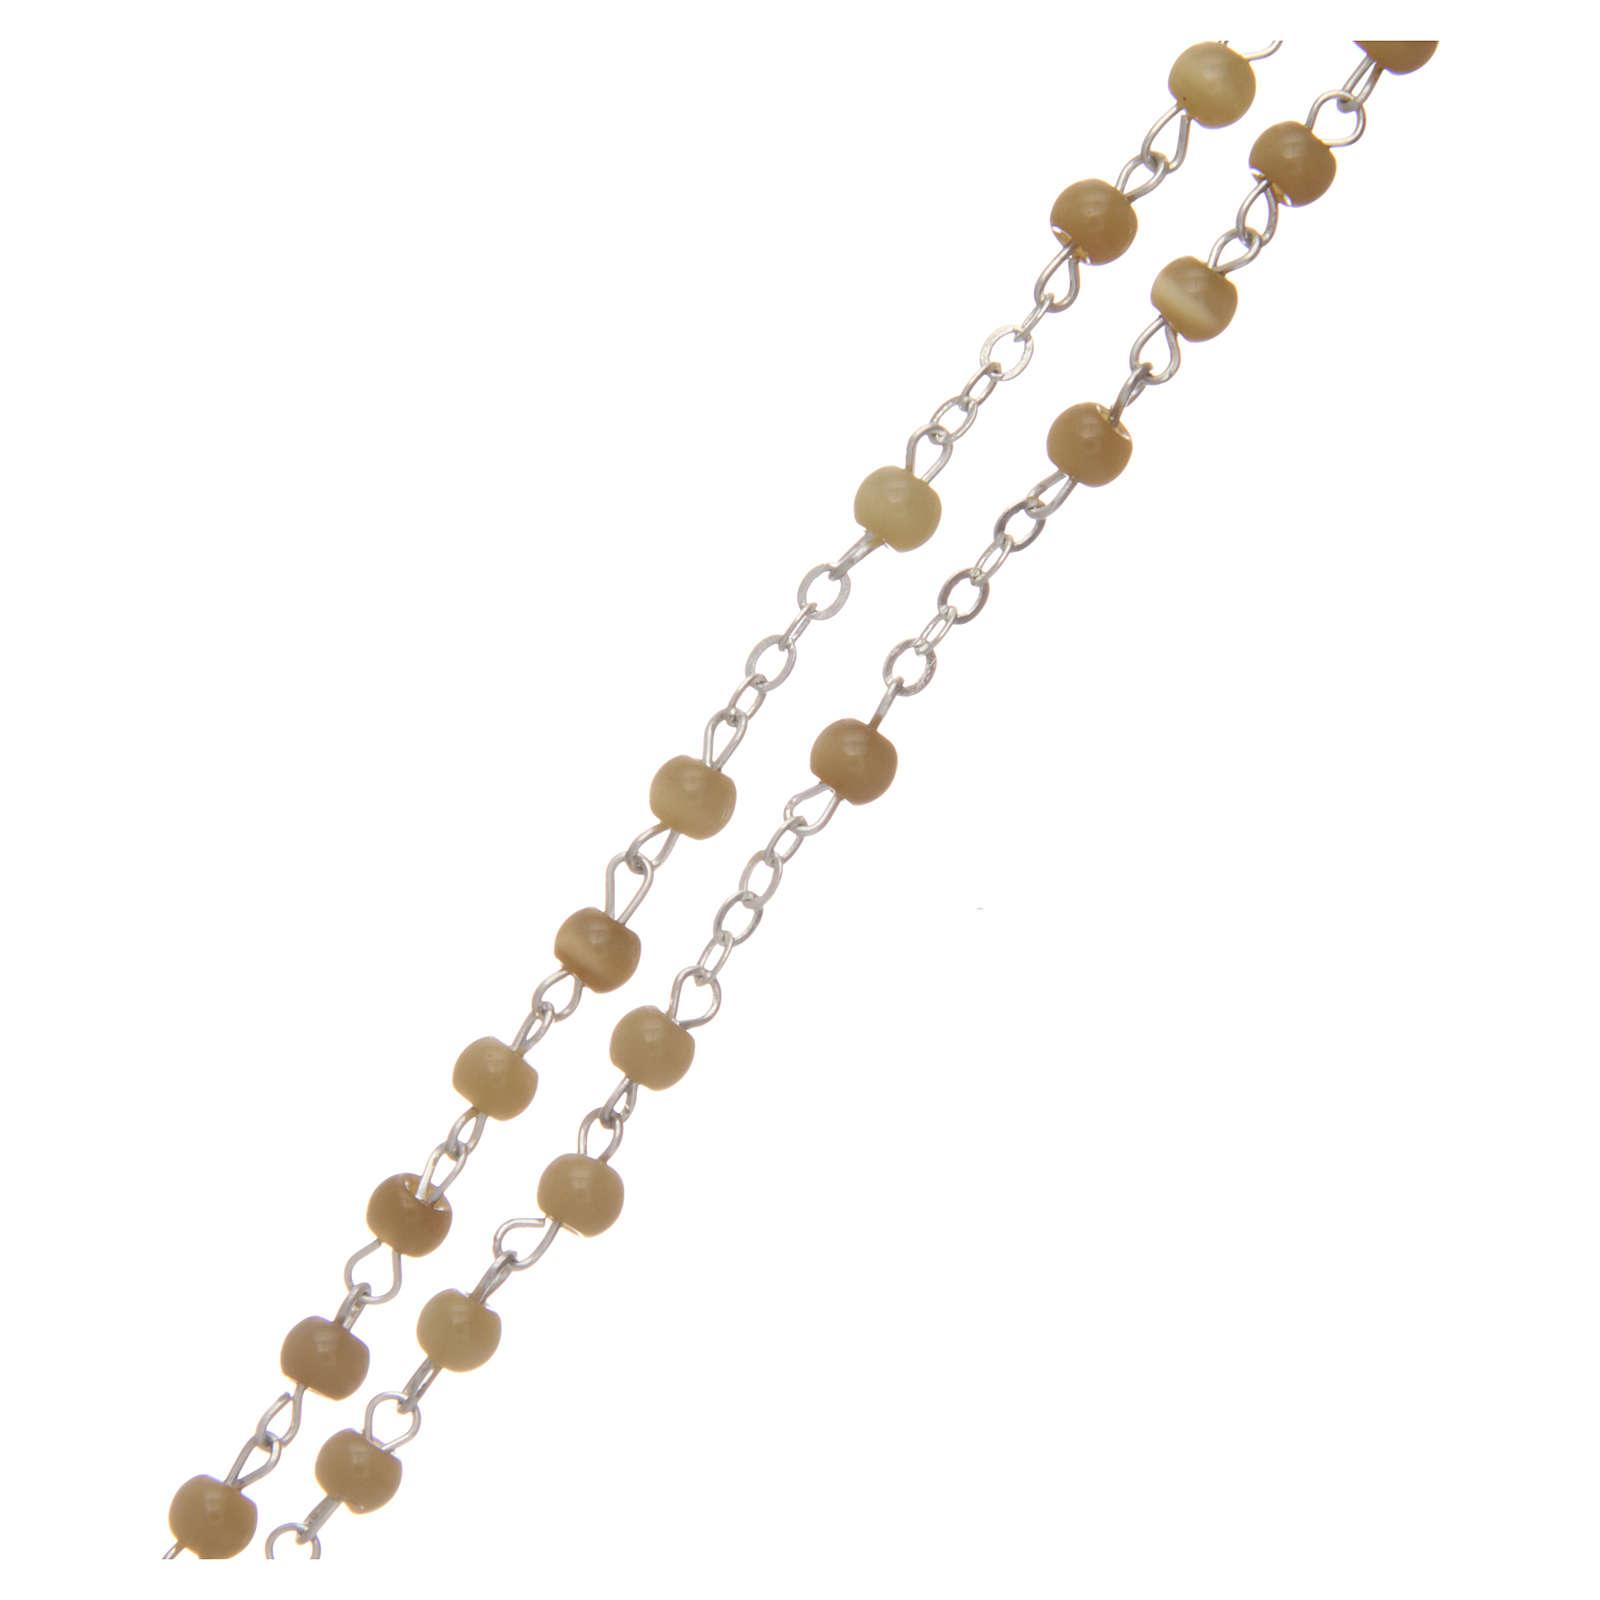 Rosario imitación perla redonda topacio 4 mm 4